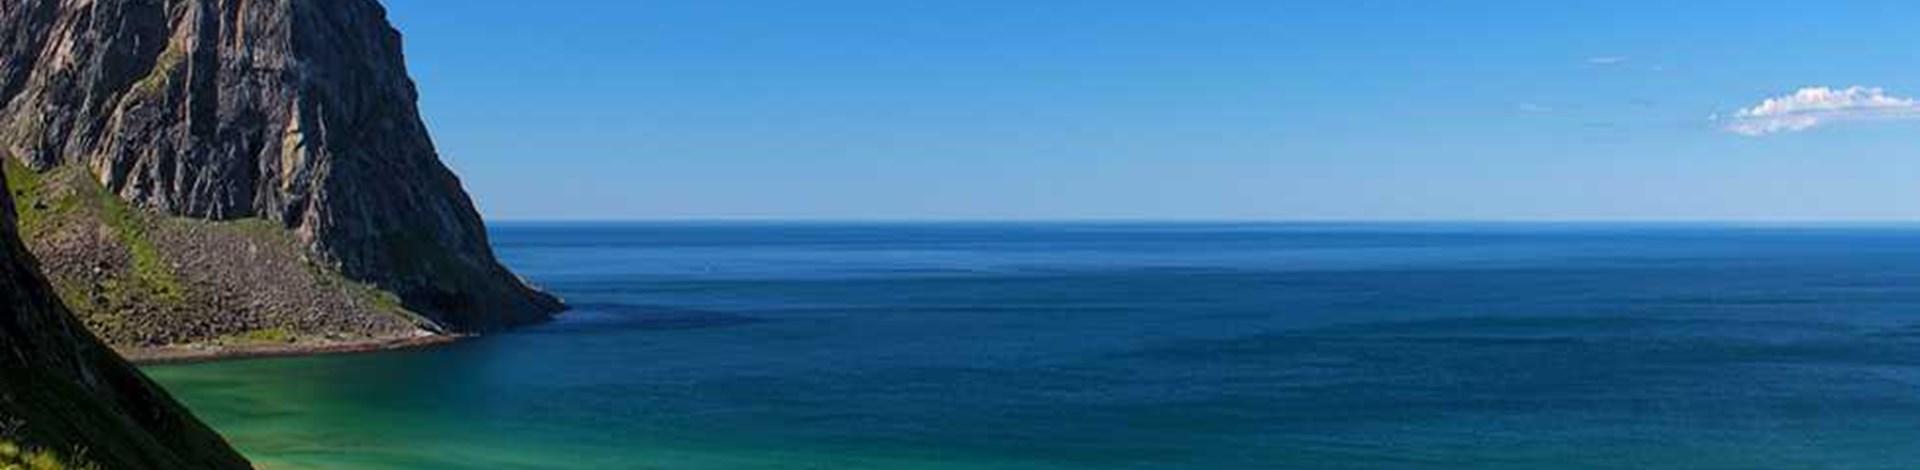 Sande beach